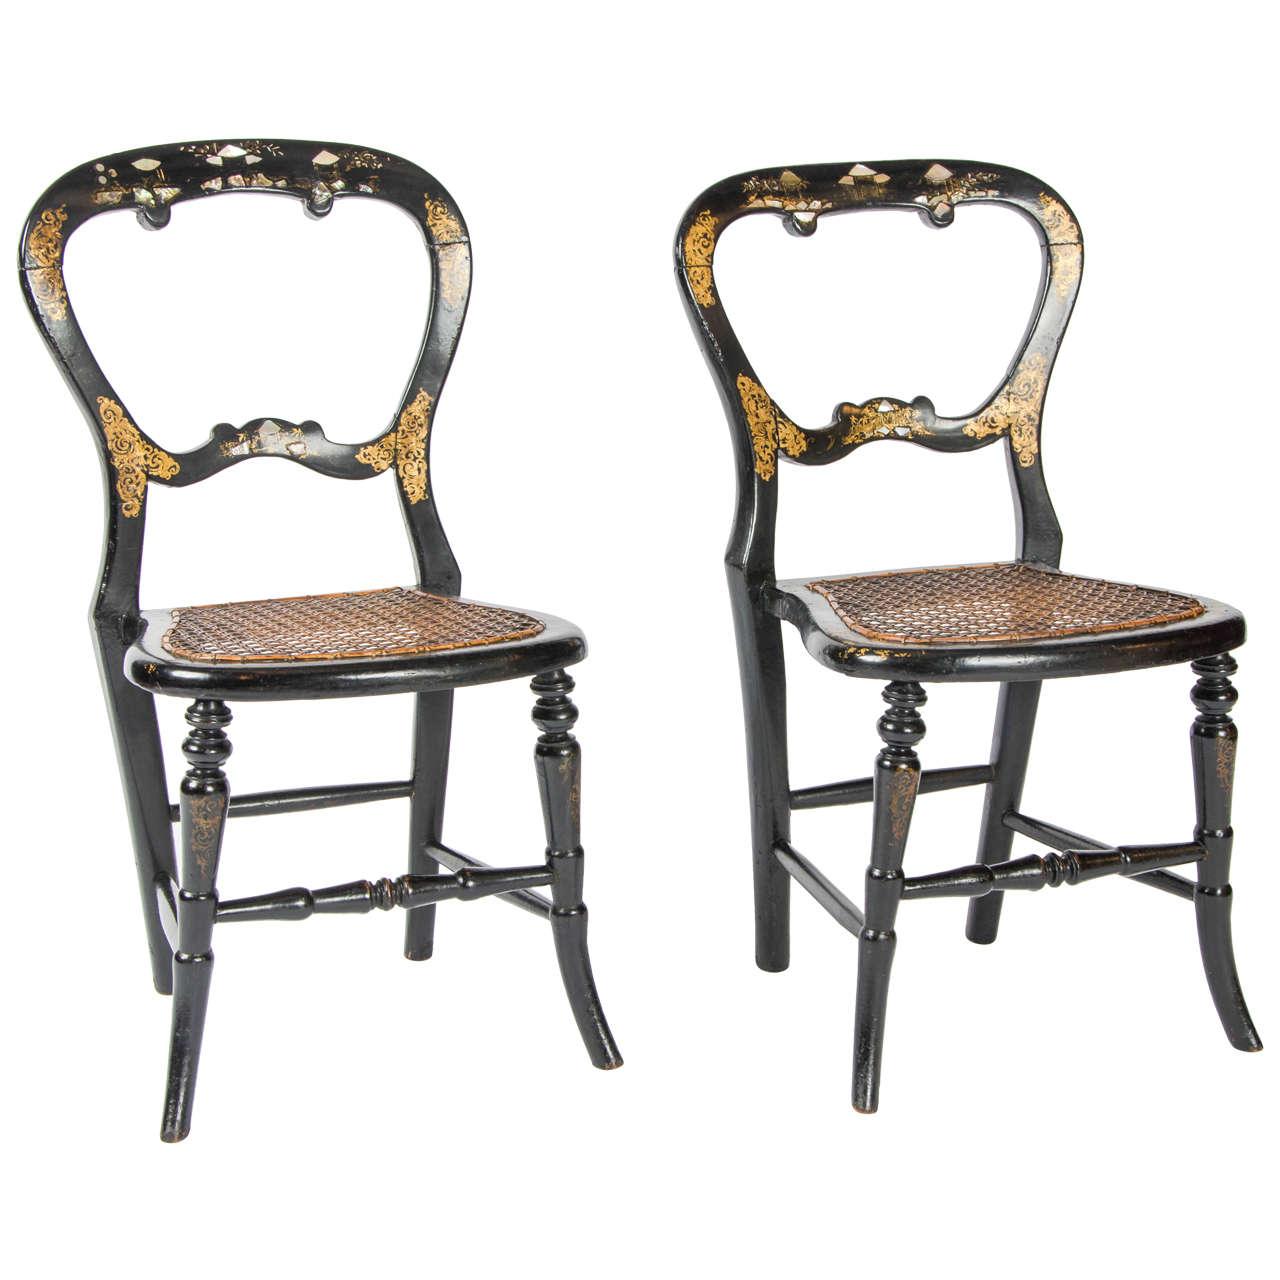 Pair of Victorian Children's Chairs